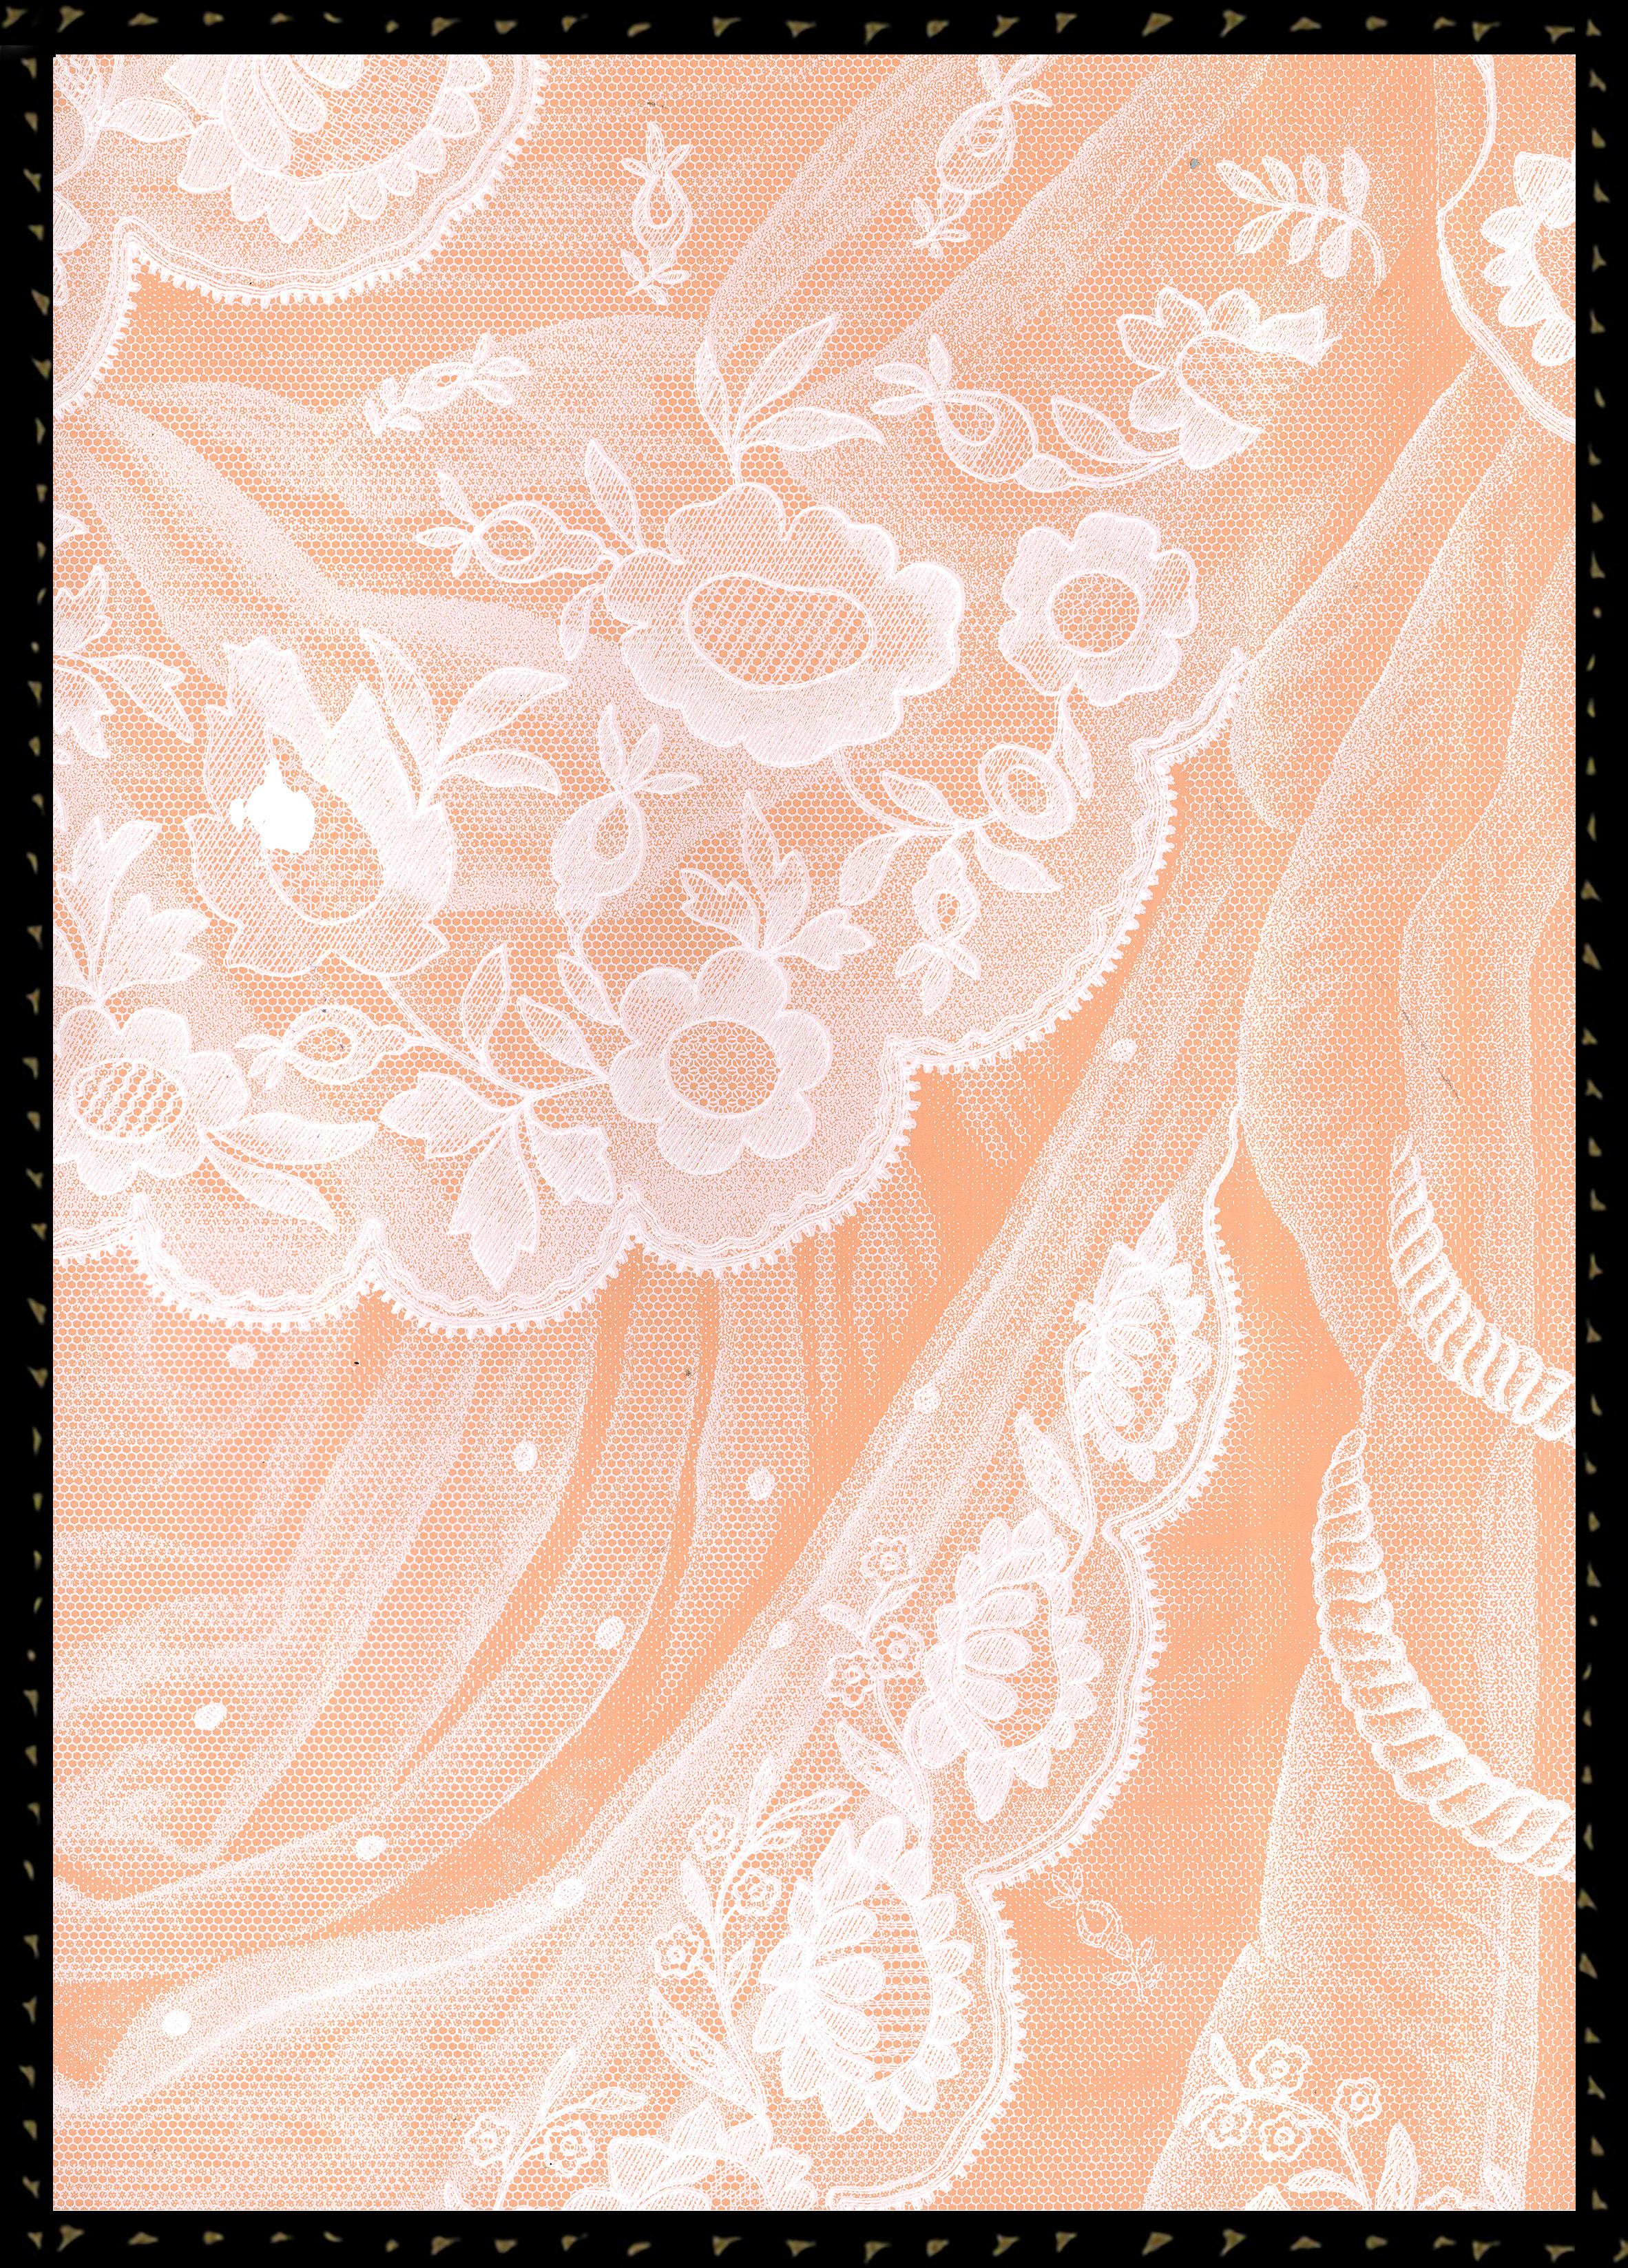 wallpaper 10.jpg